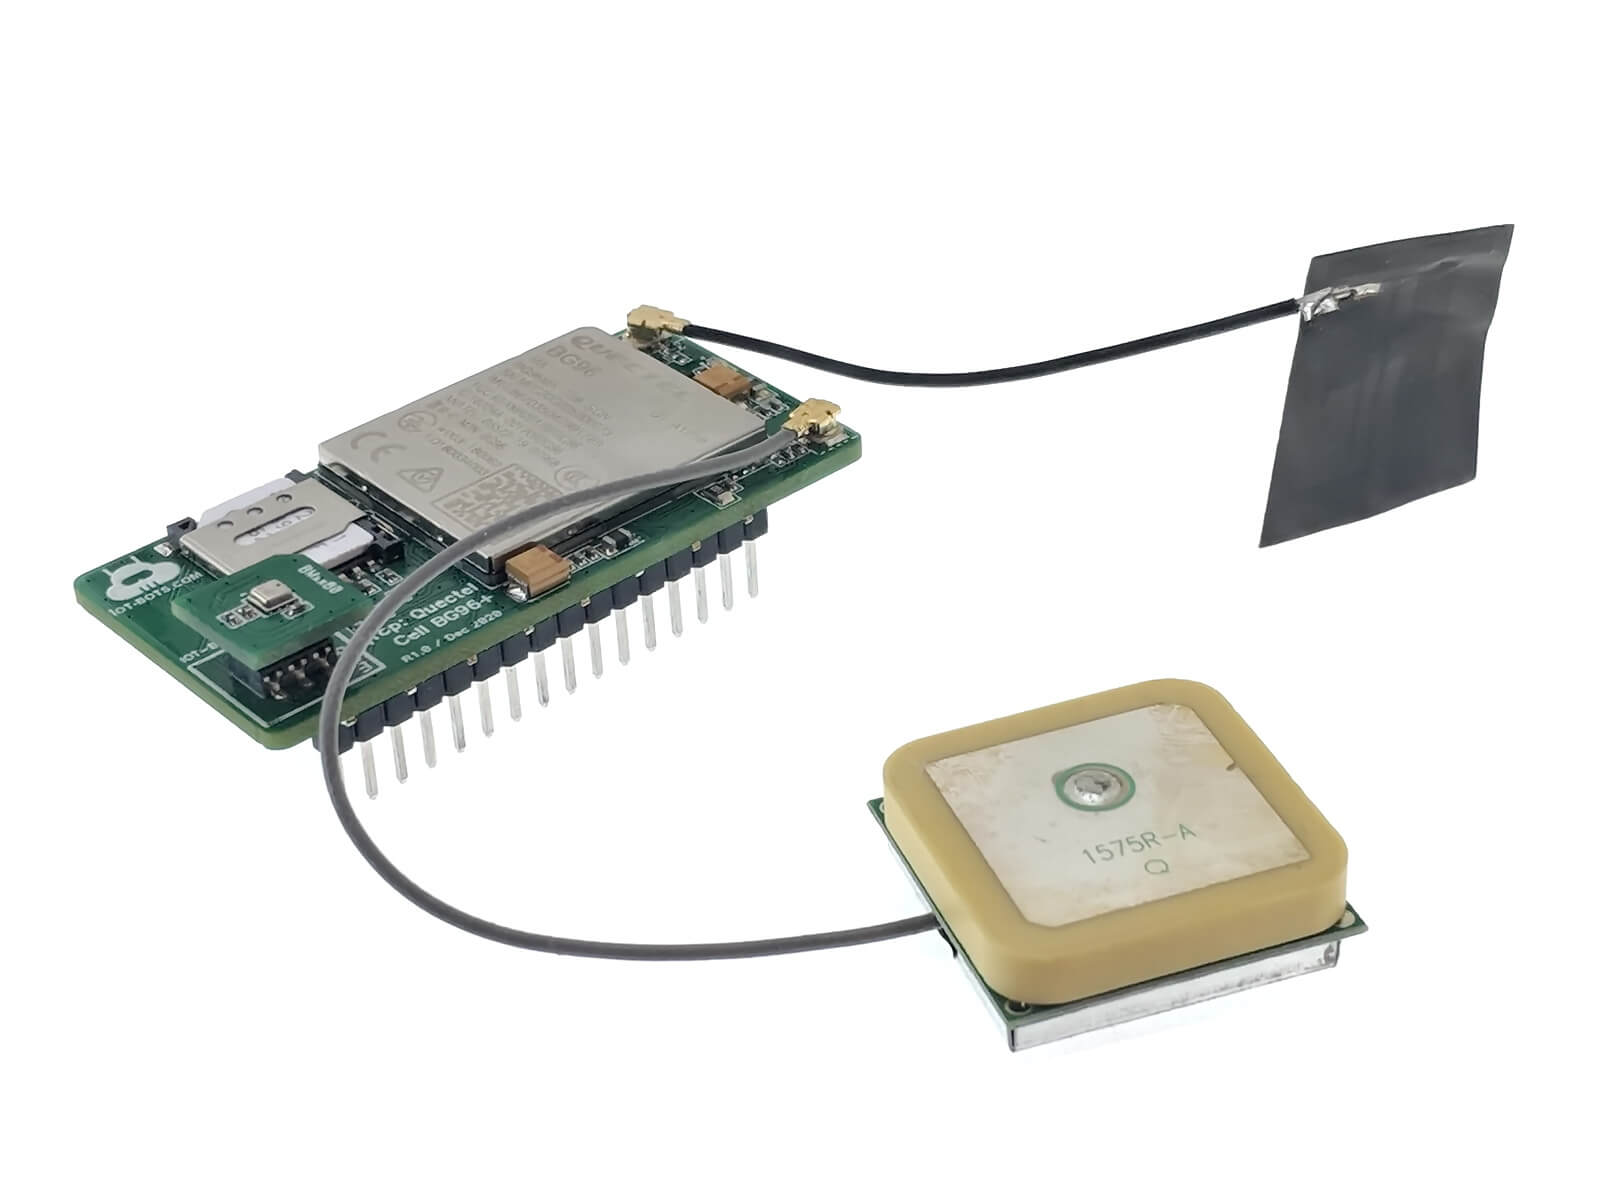 iotbotscom-qtop-cell-quectel-bg96-afc-qbox-iot-antennas